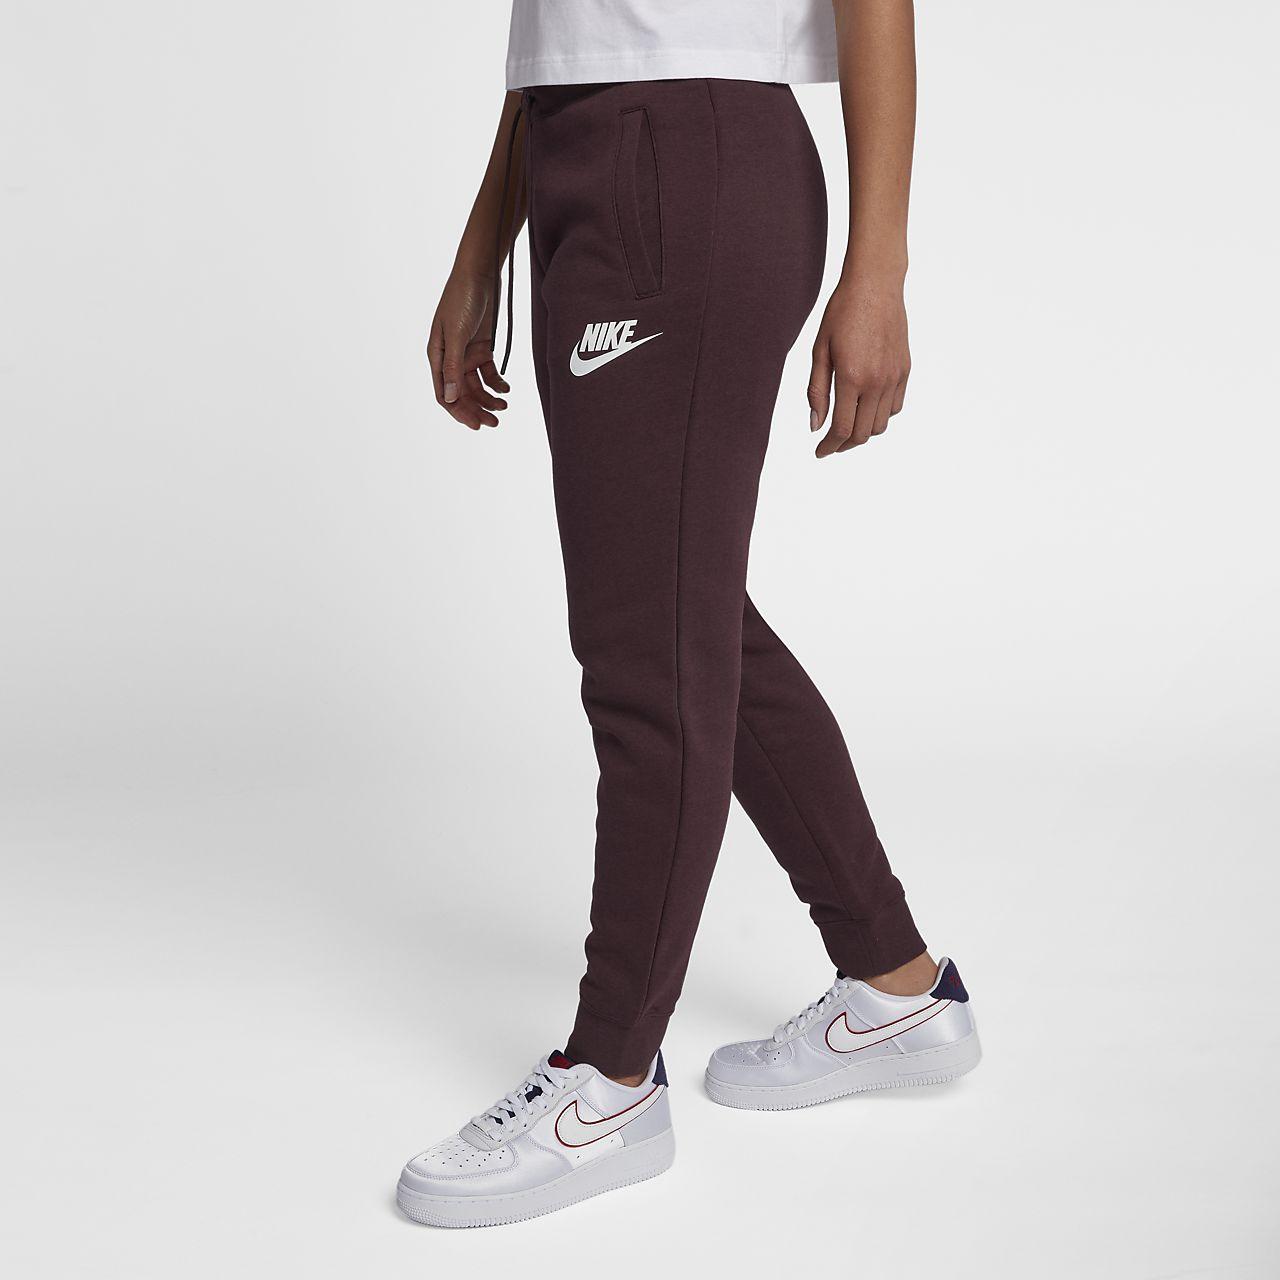 Nike Sportswear Rally Mujer Para Pantalones f7vY6ybg